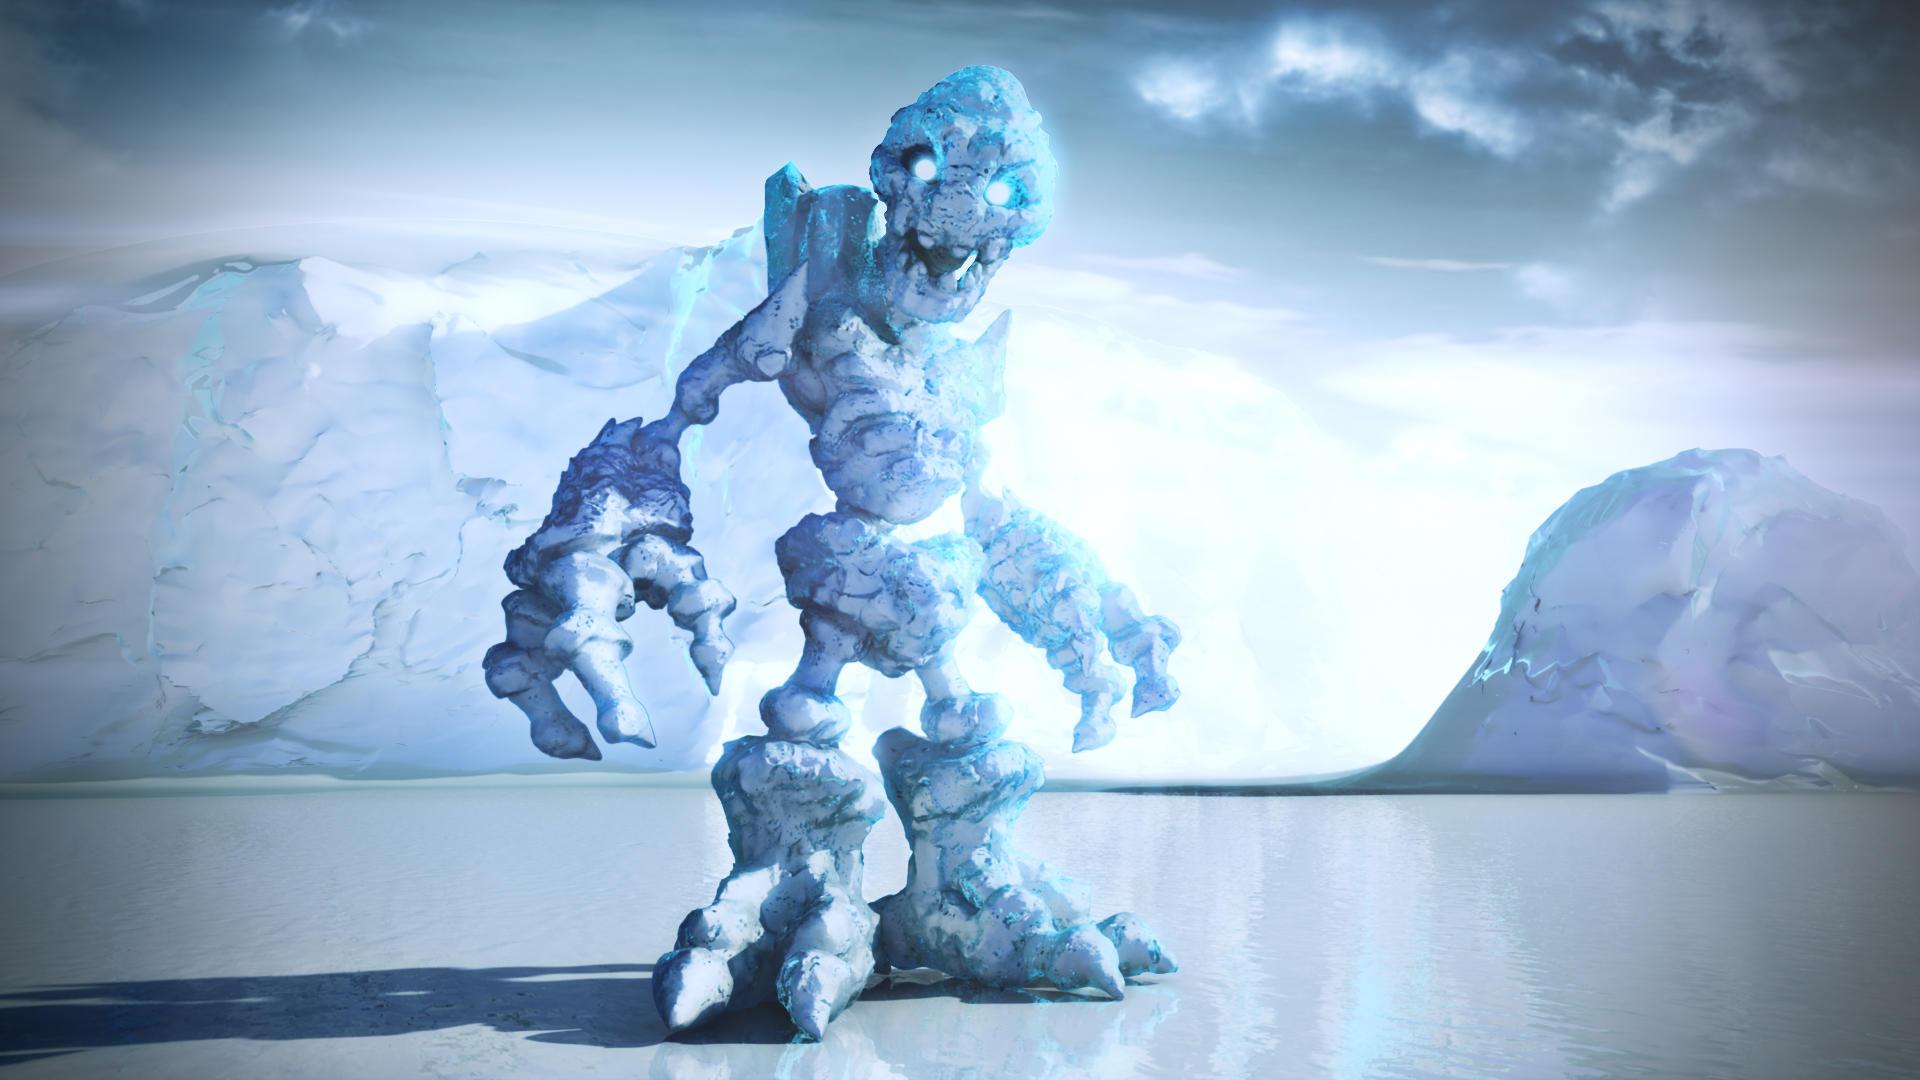 Ice Golem by JAW1002